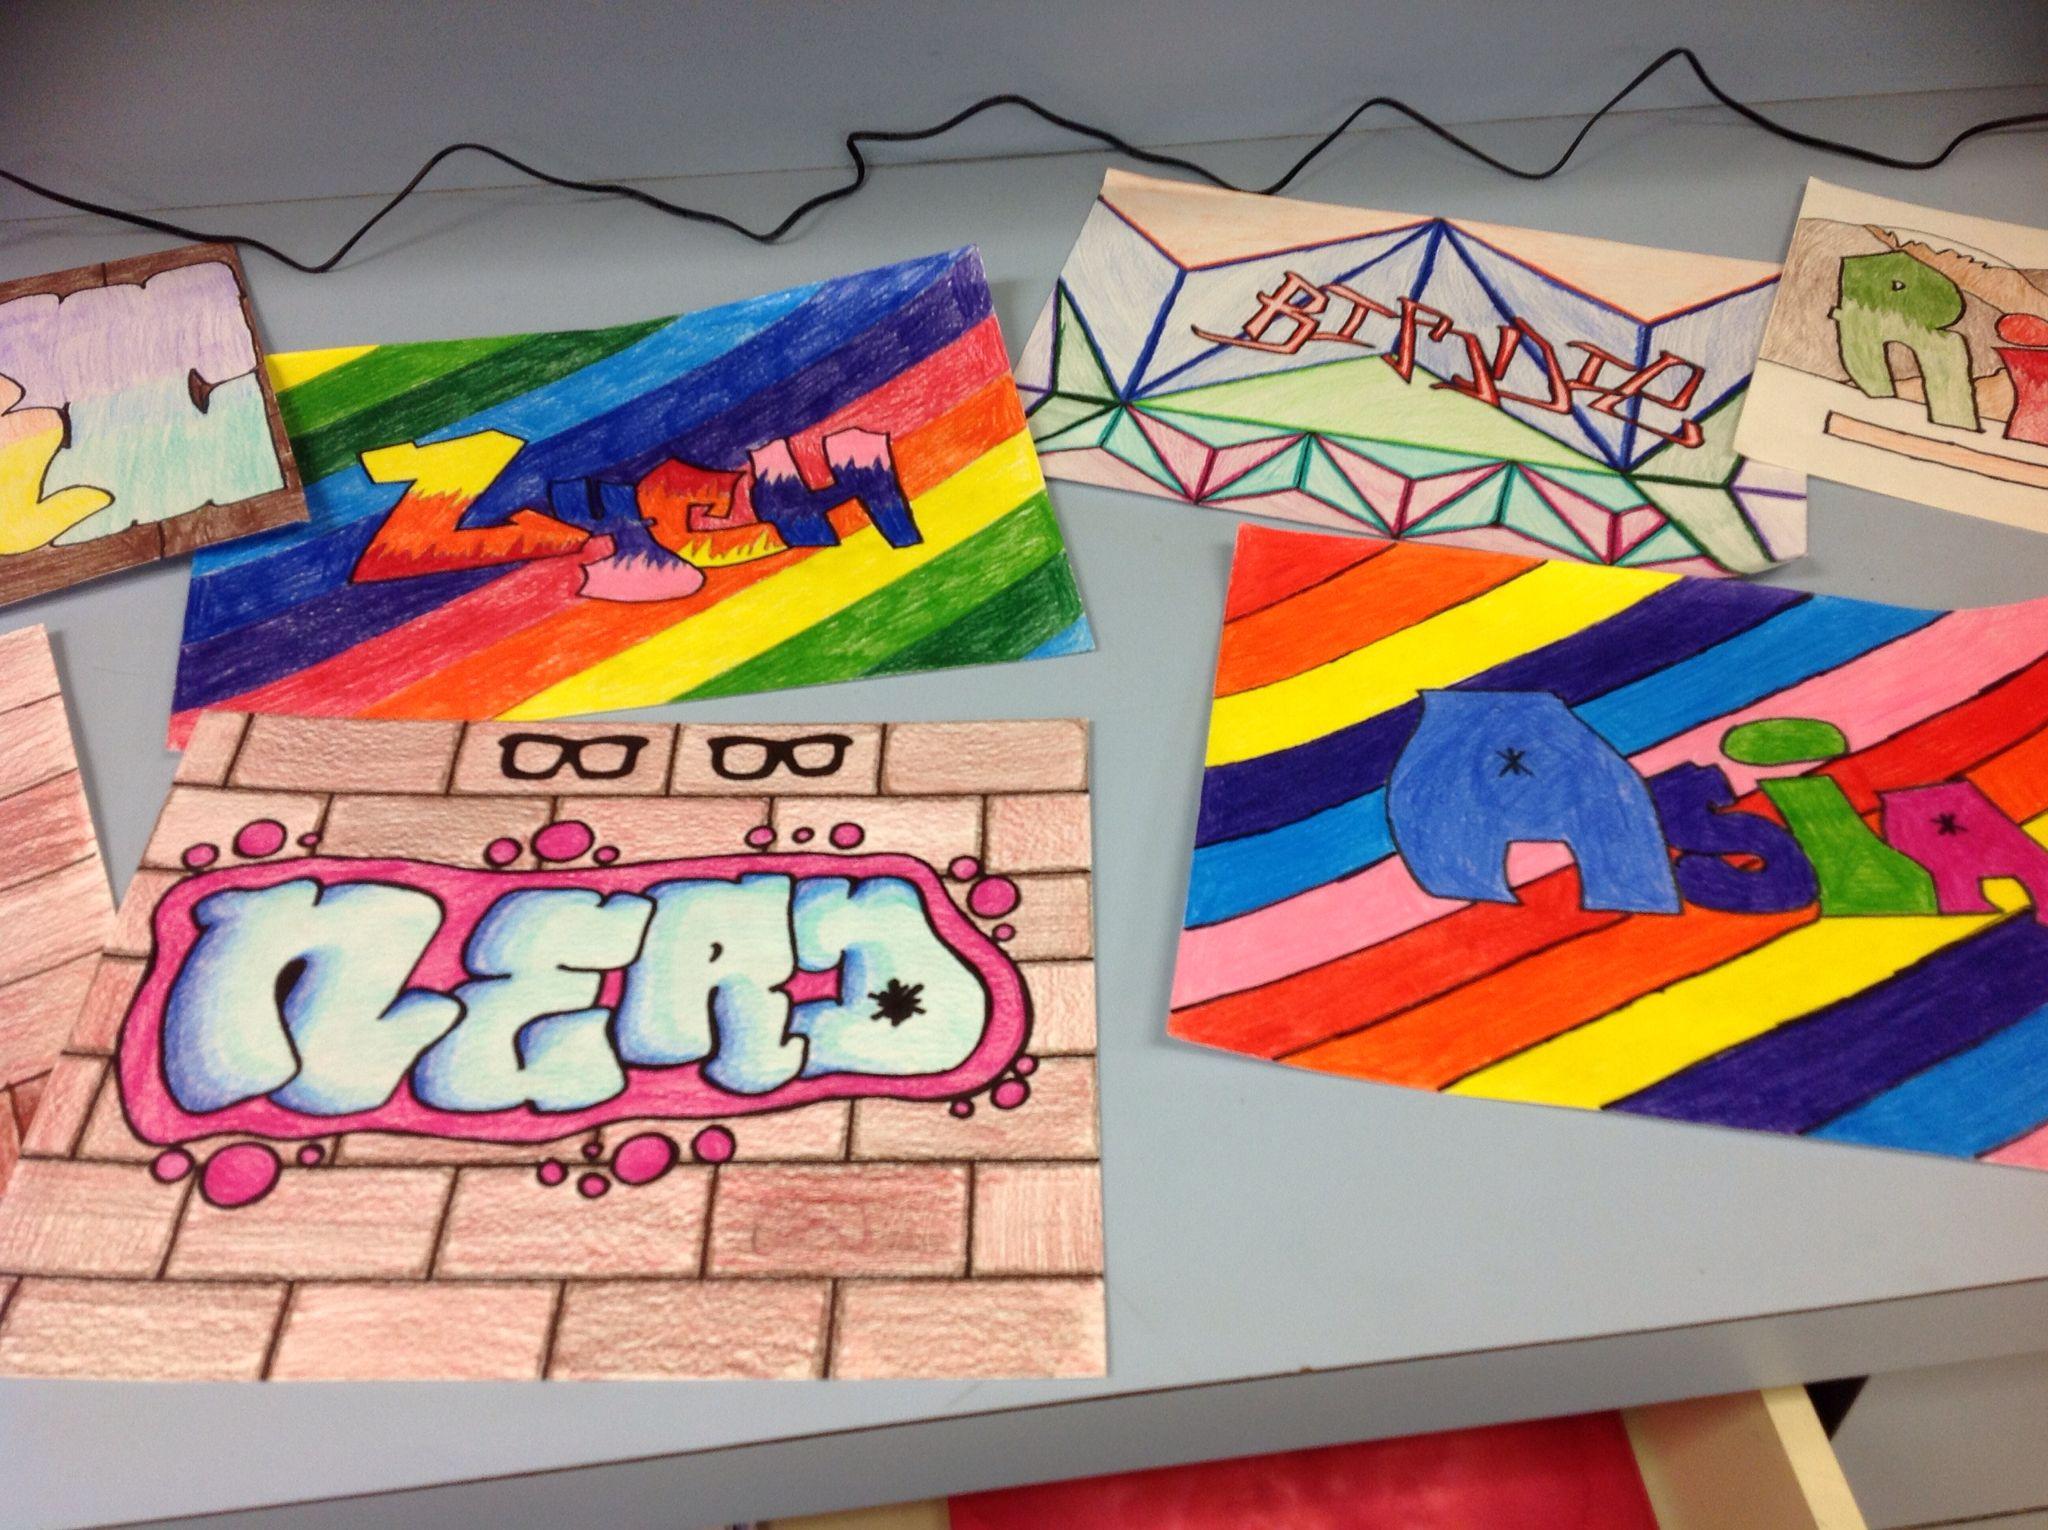 No art 8th grade graffiti art